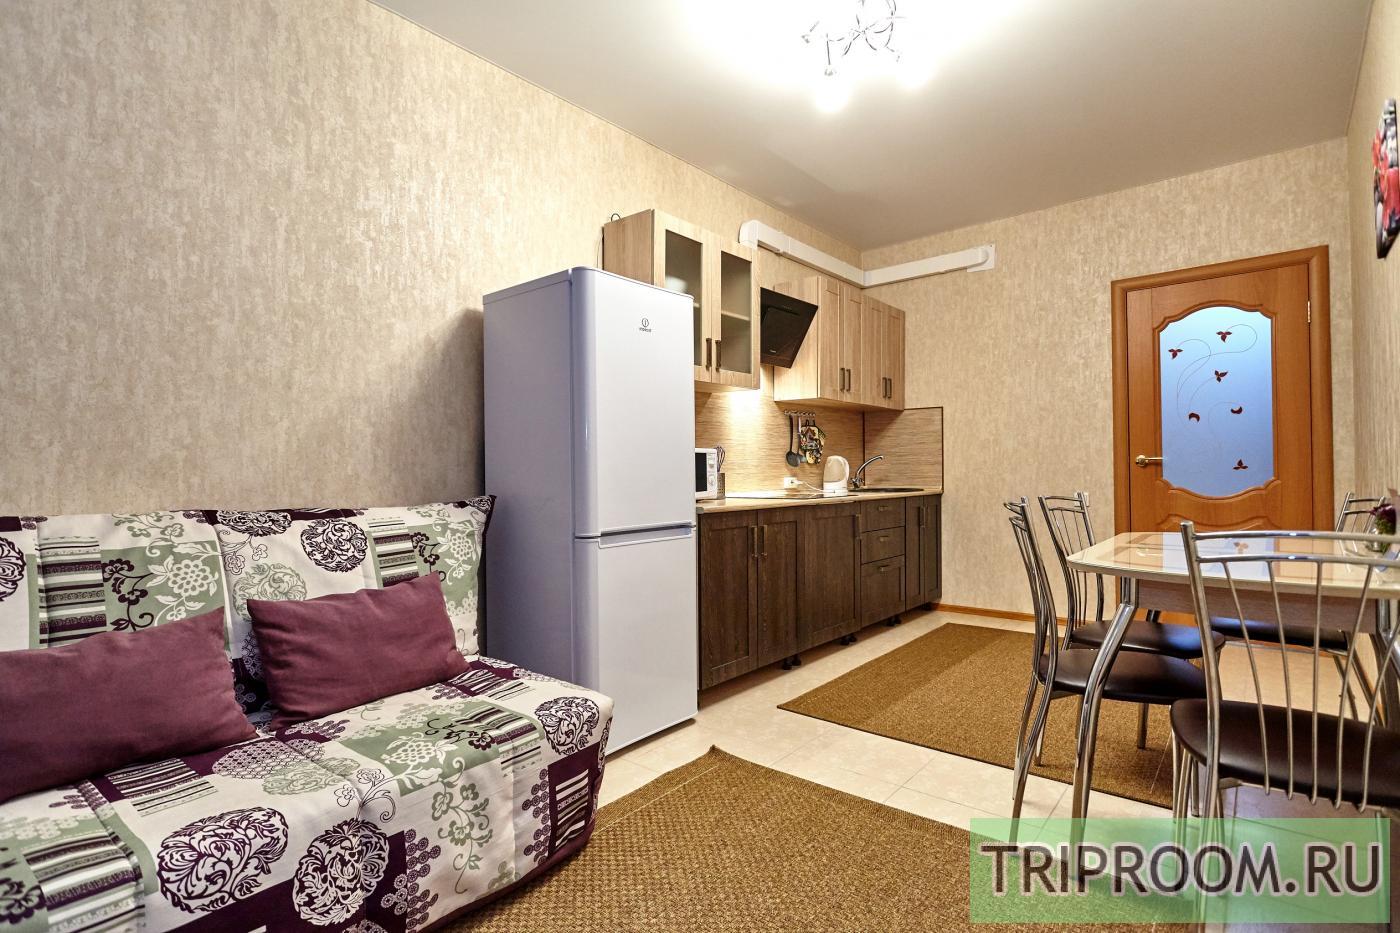 1-комнатная квартира посуточно (вариант № 6860), ул. Соколова улица, фото № 8